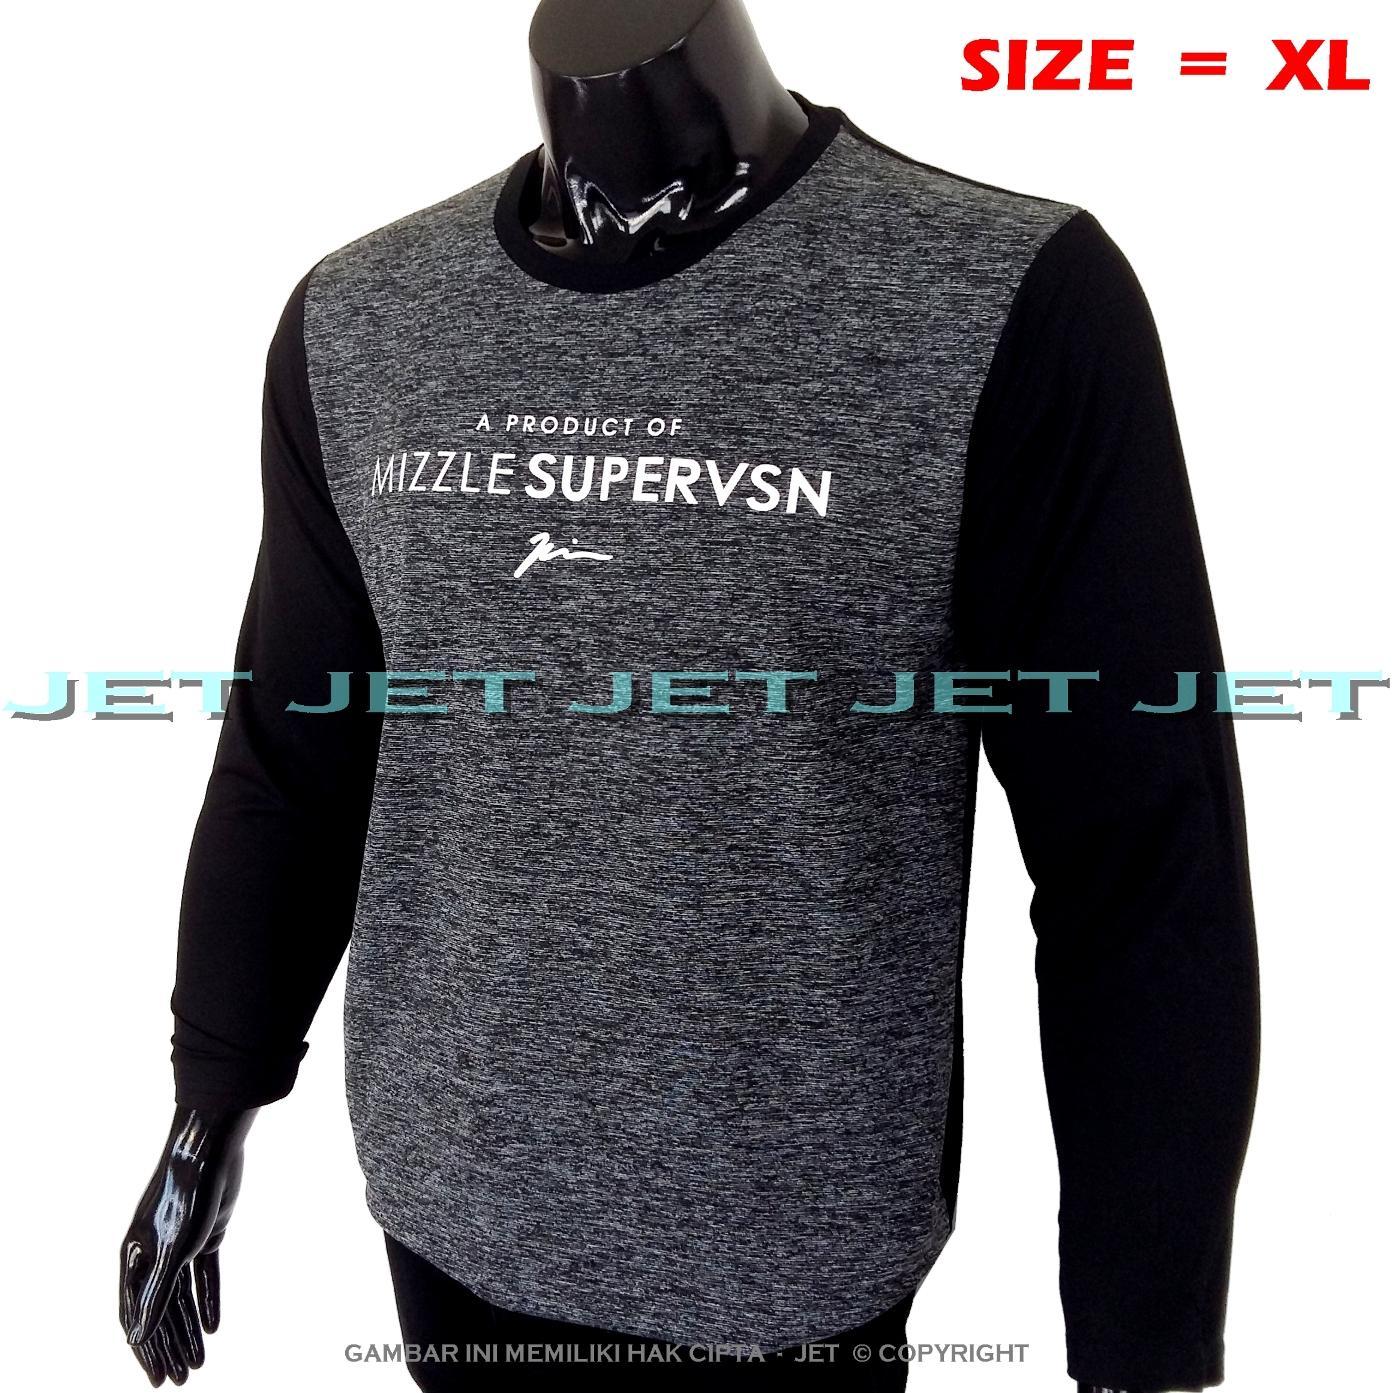 JeT - Kaos Distro MIZZLE SUPERVSN Size XL Dewasa Lengan Panjang Soft Rayon Viscose Lycra Tidak Pasaran Sablonan Eropa Gradasi